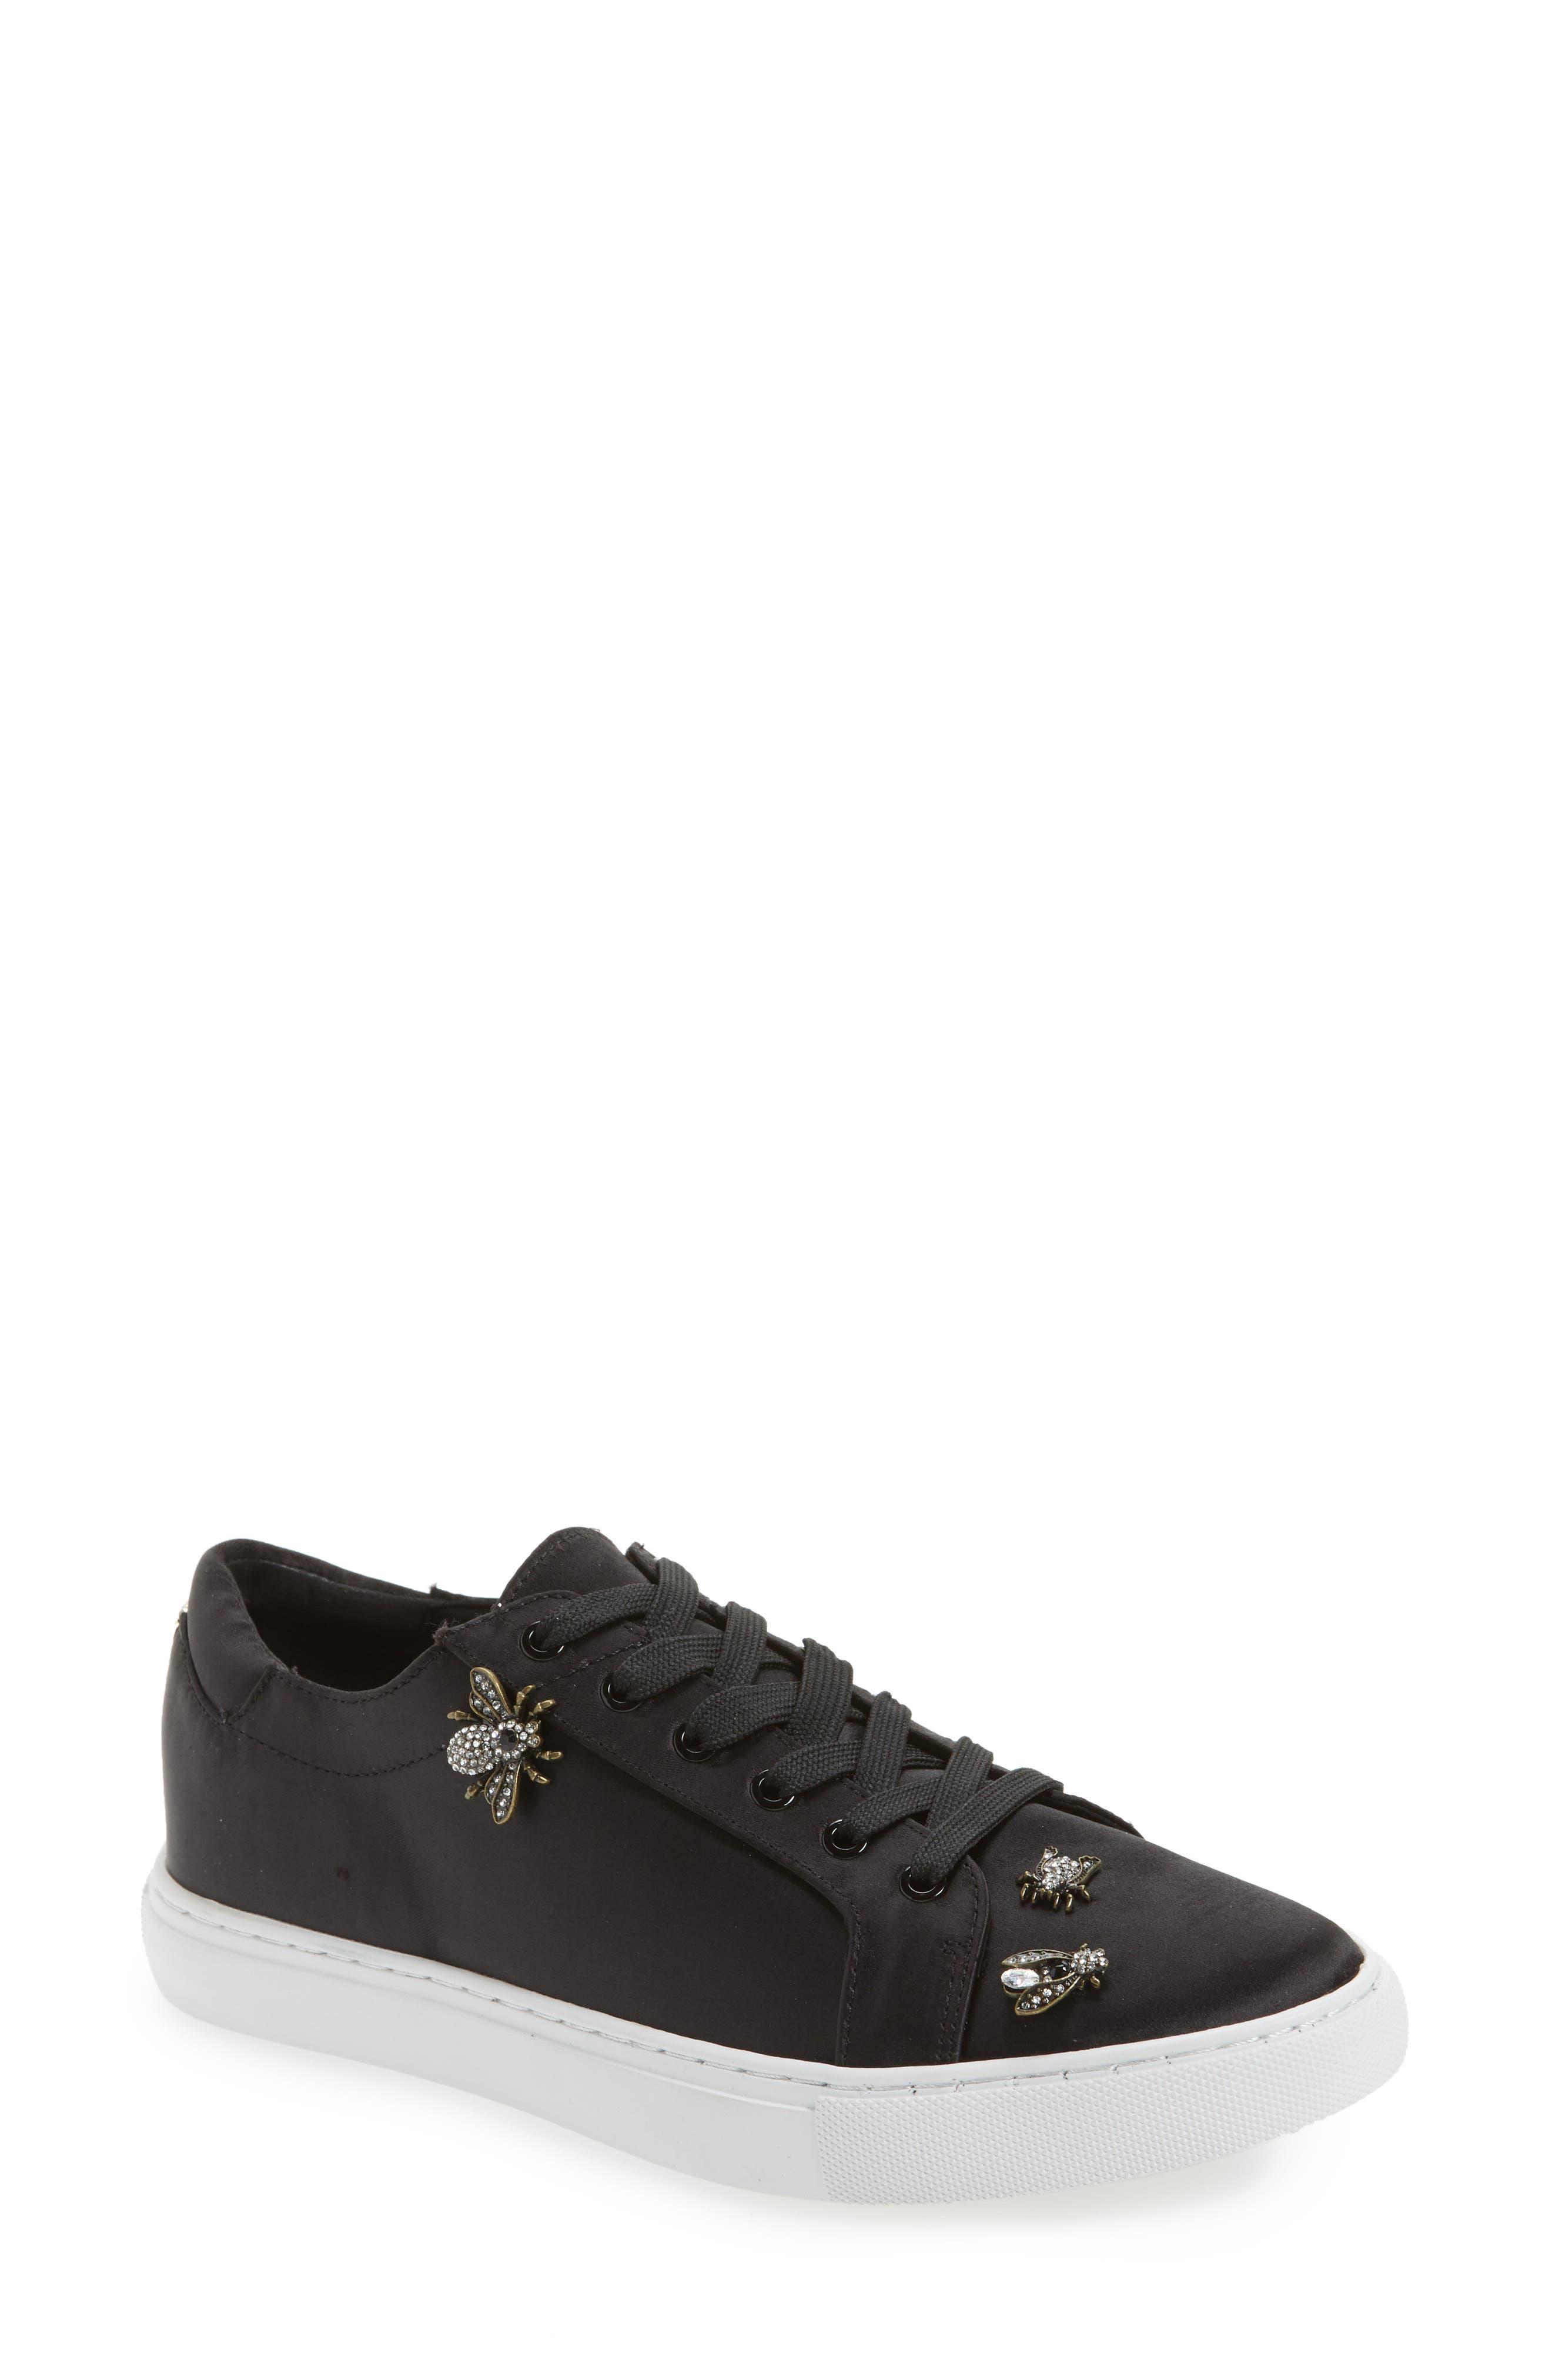 'Kam' Sneaker,                         Main,                         color, Black Satin